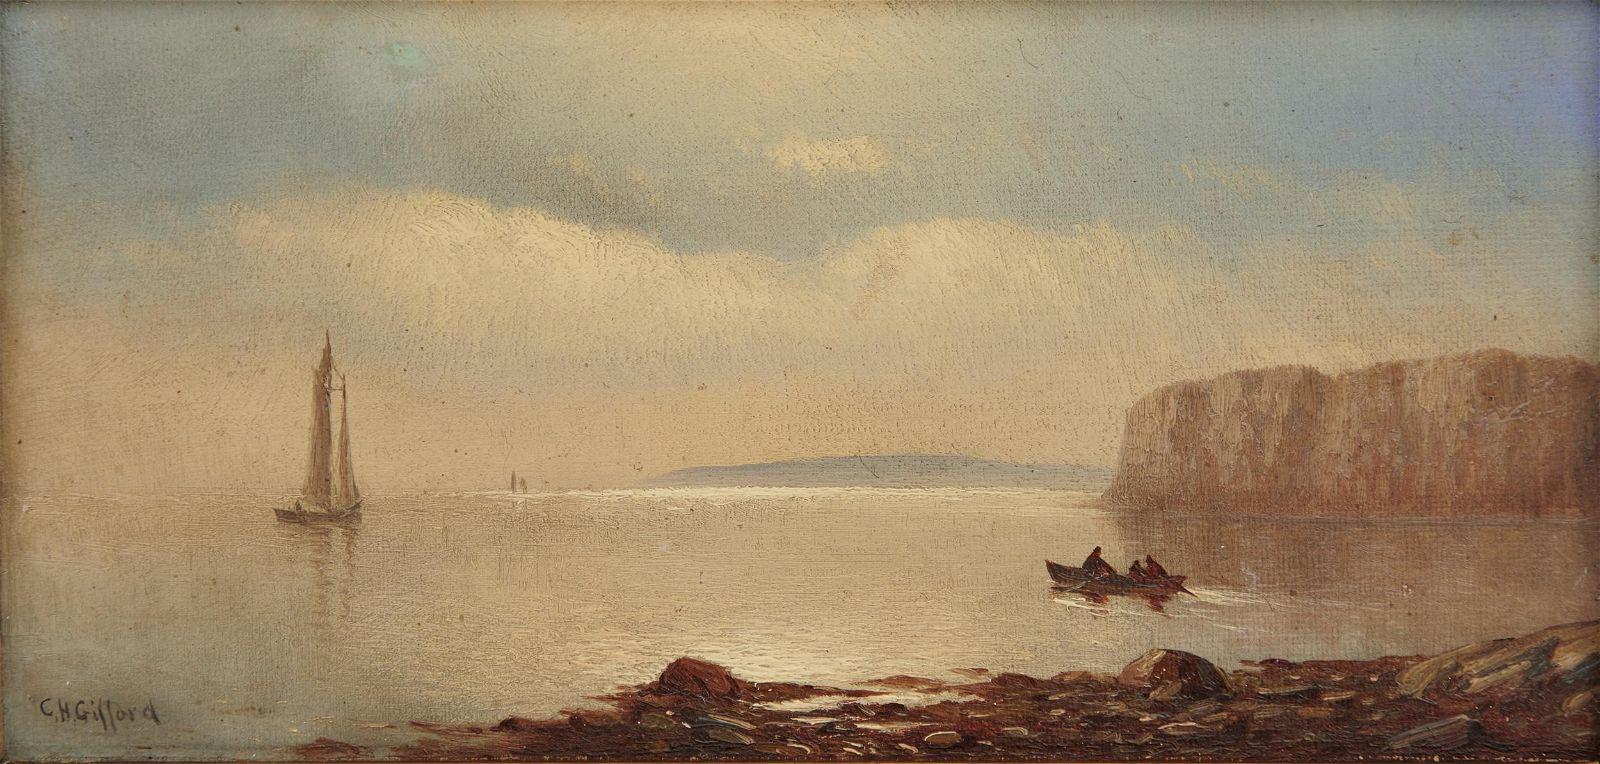 CHARLES HENRY GIFFORD, (American, 1839-1904), Coastal